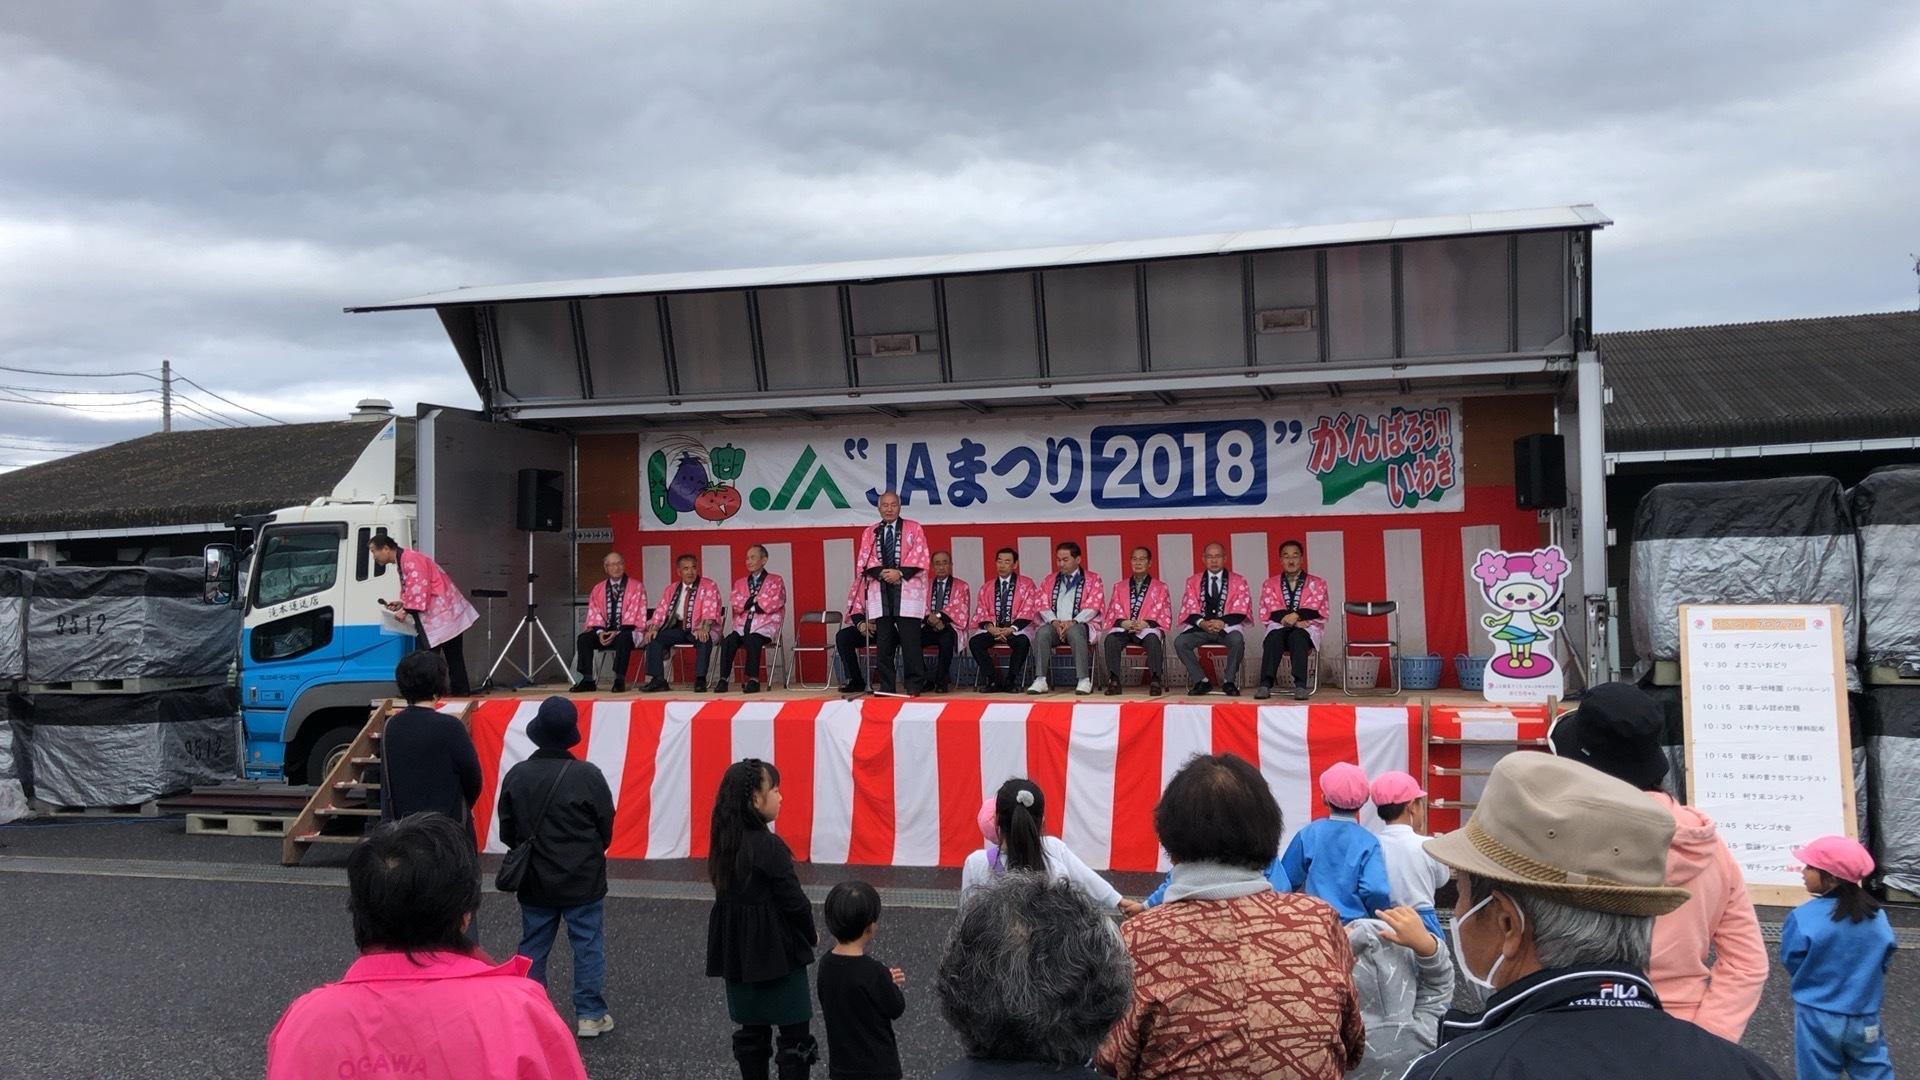 2018.11.10〜11 JAまつり、大熊町ふるさと祭りほか_a0255967_13504002.jpg